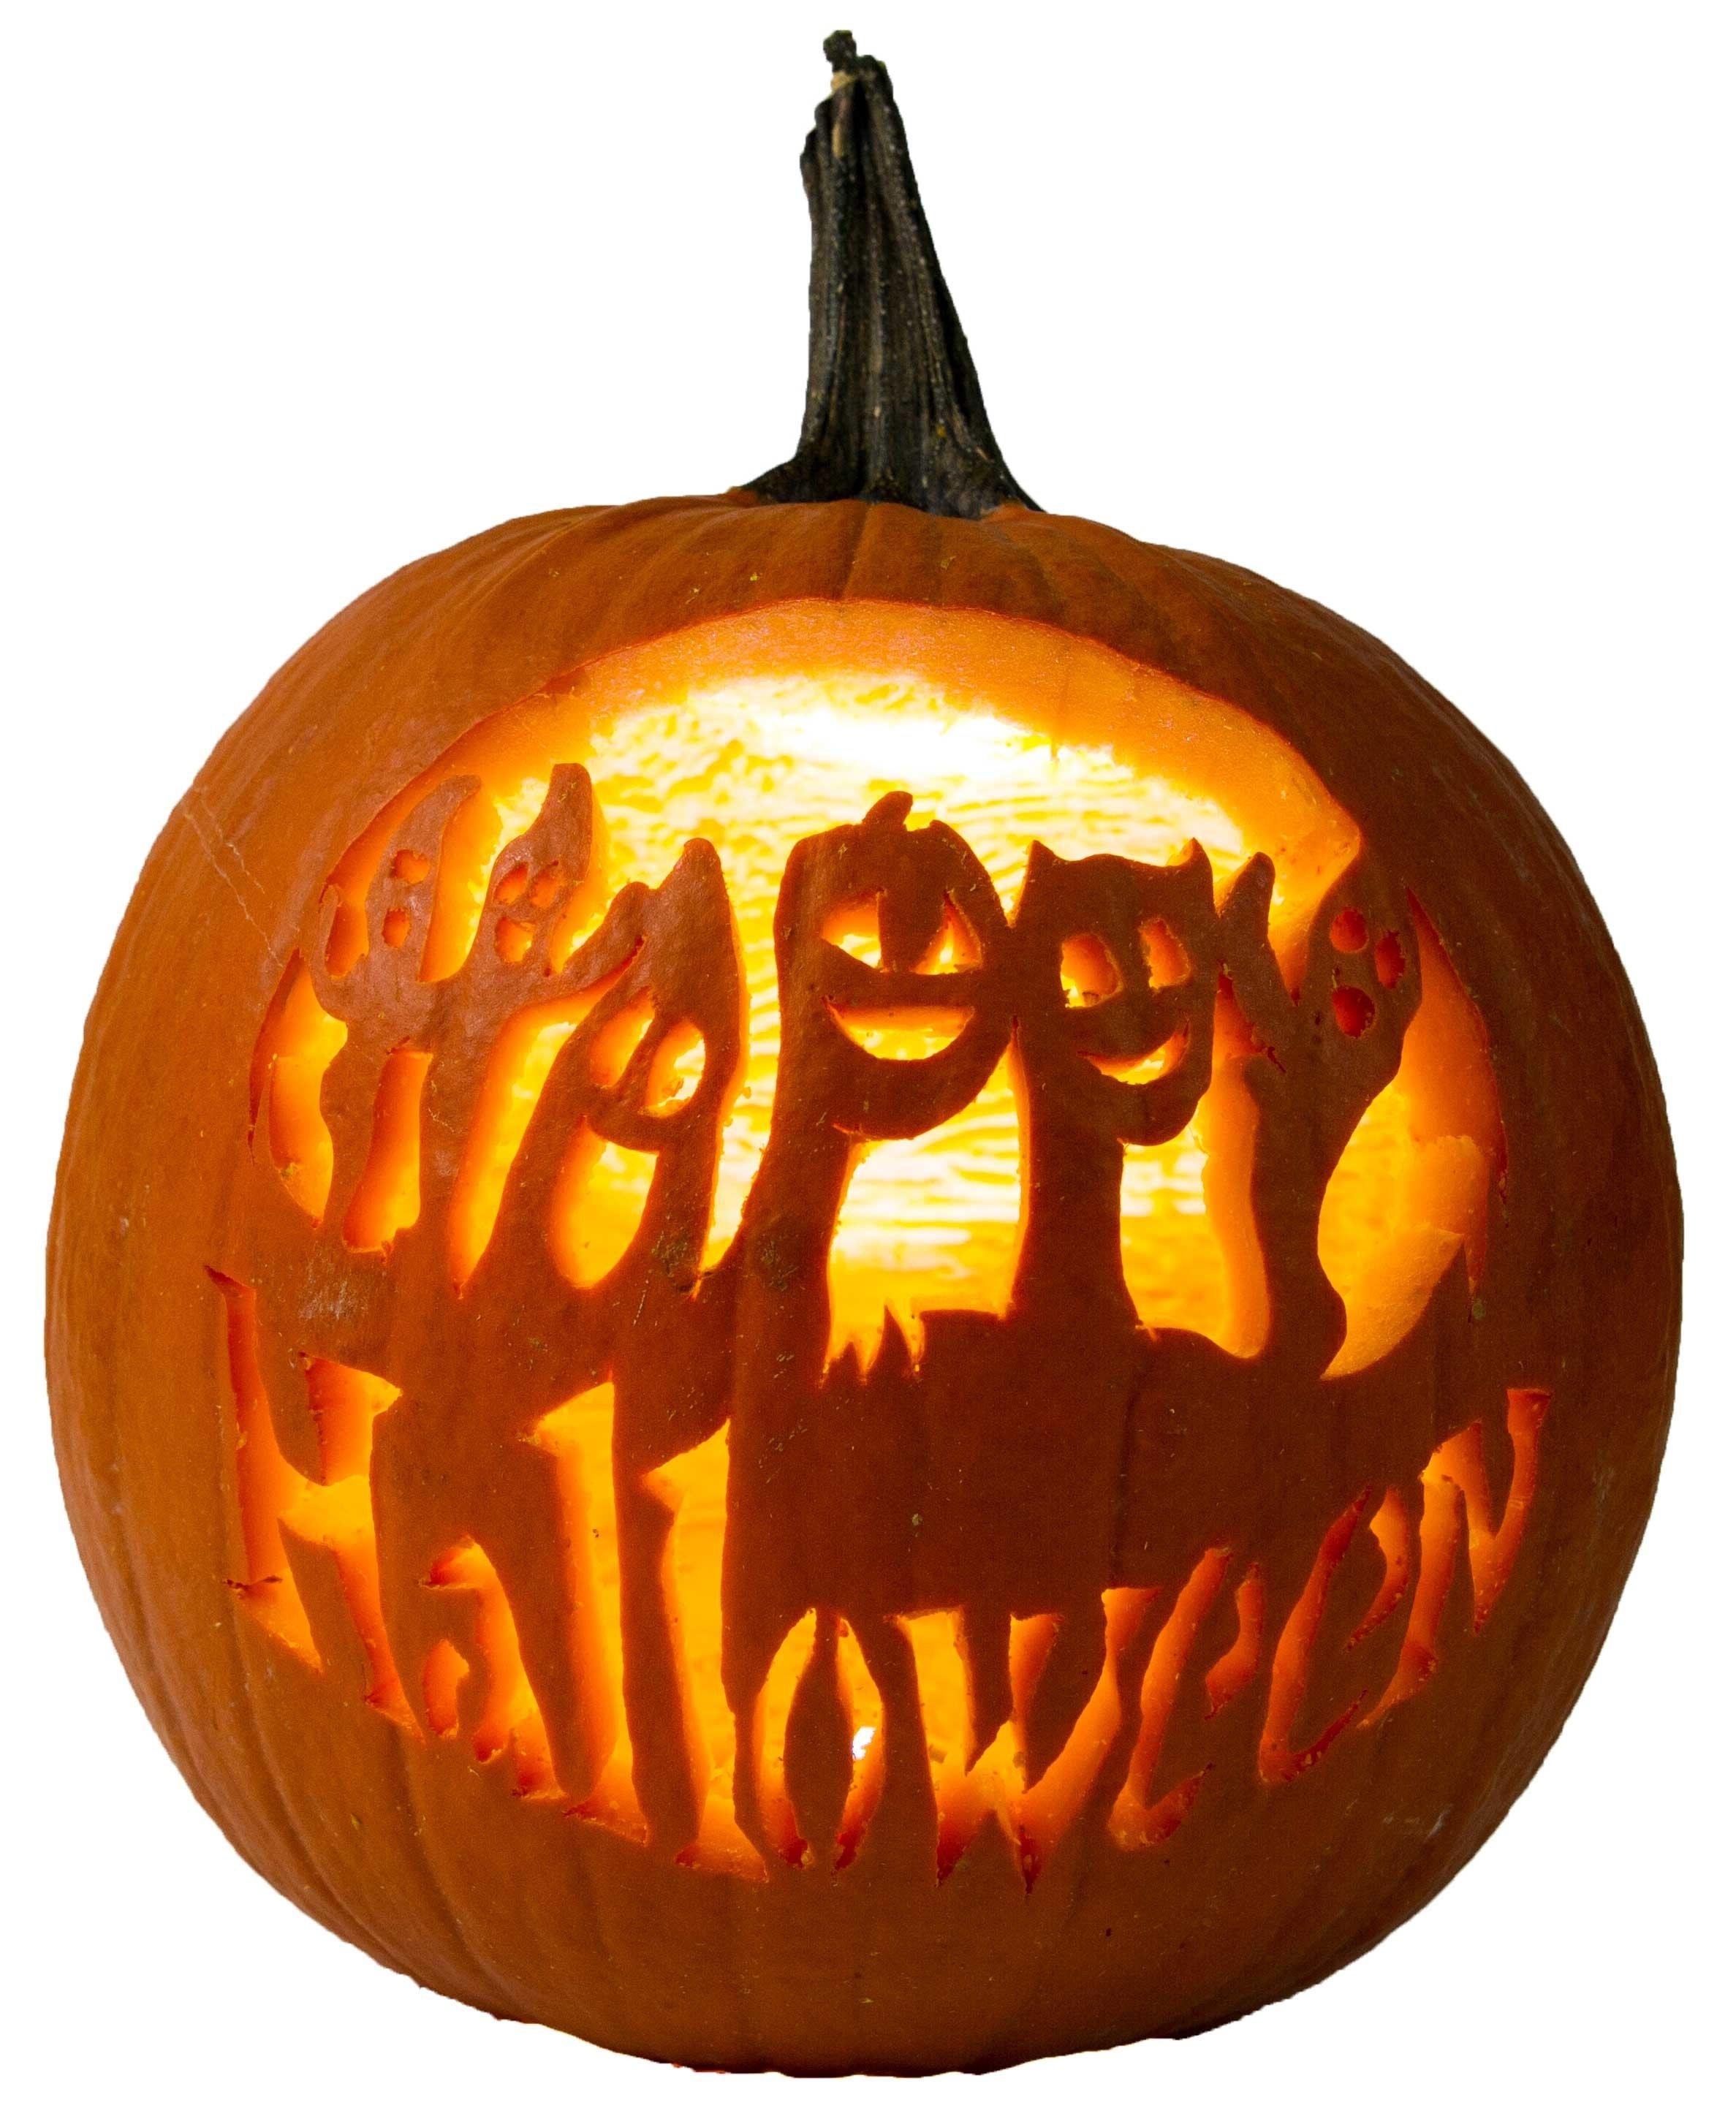 10 Cute Cool Jack O Lantern Ideas 24 creative jack o lantern ideas to up your pumpkin carving game